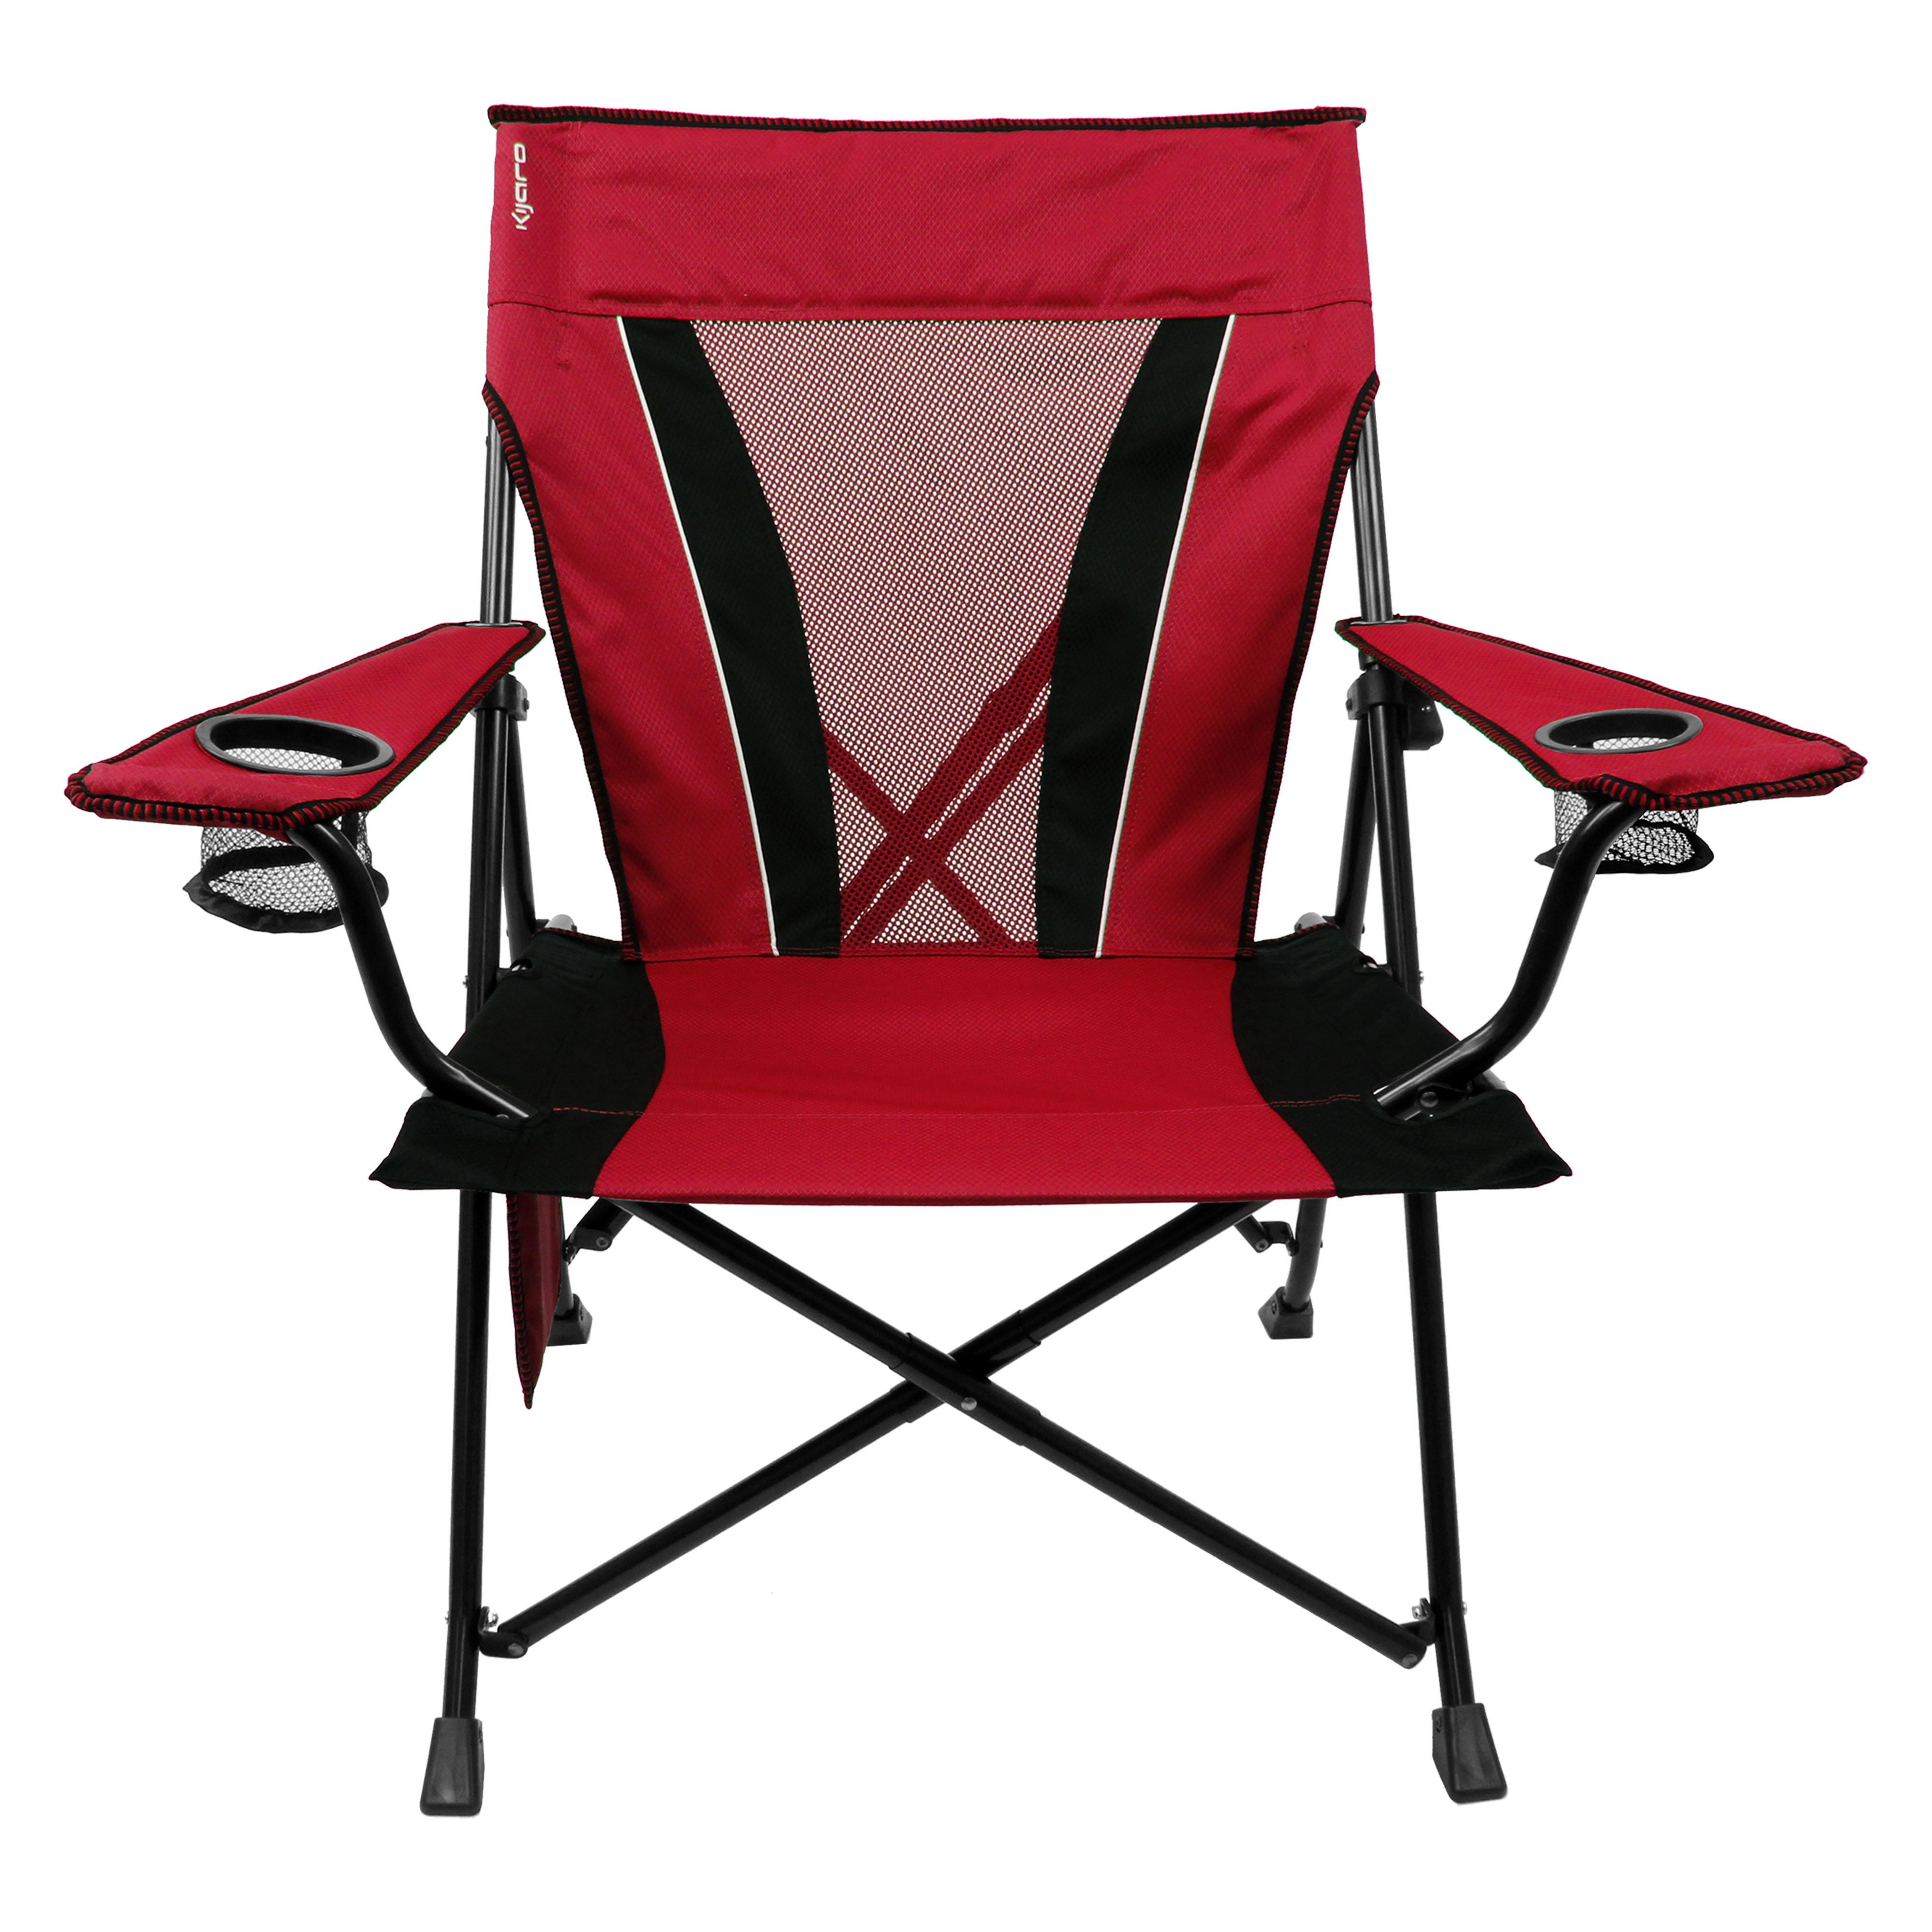 Kijaro Xxl Dual Lock Folding Camping Chair Reviews Wayfair